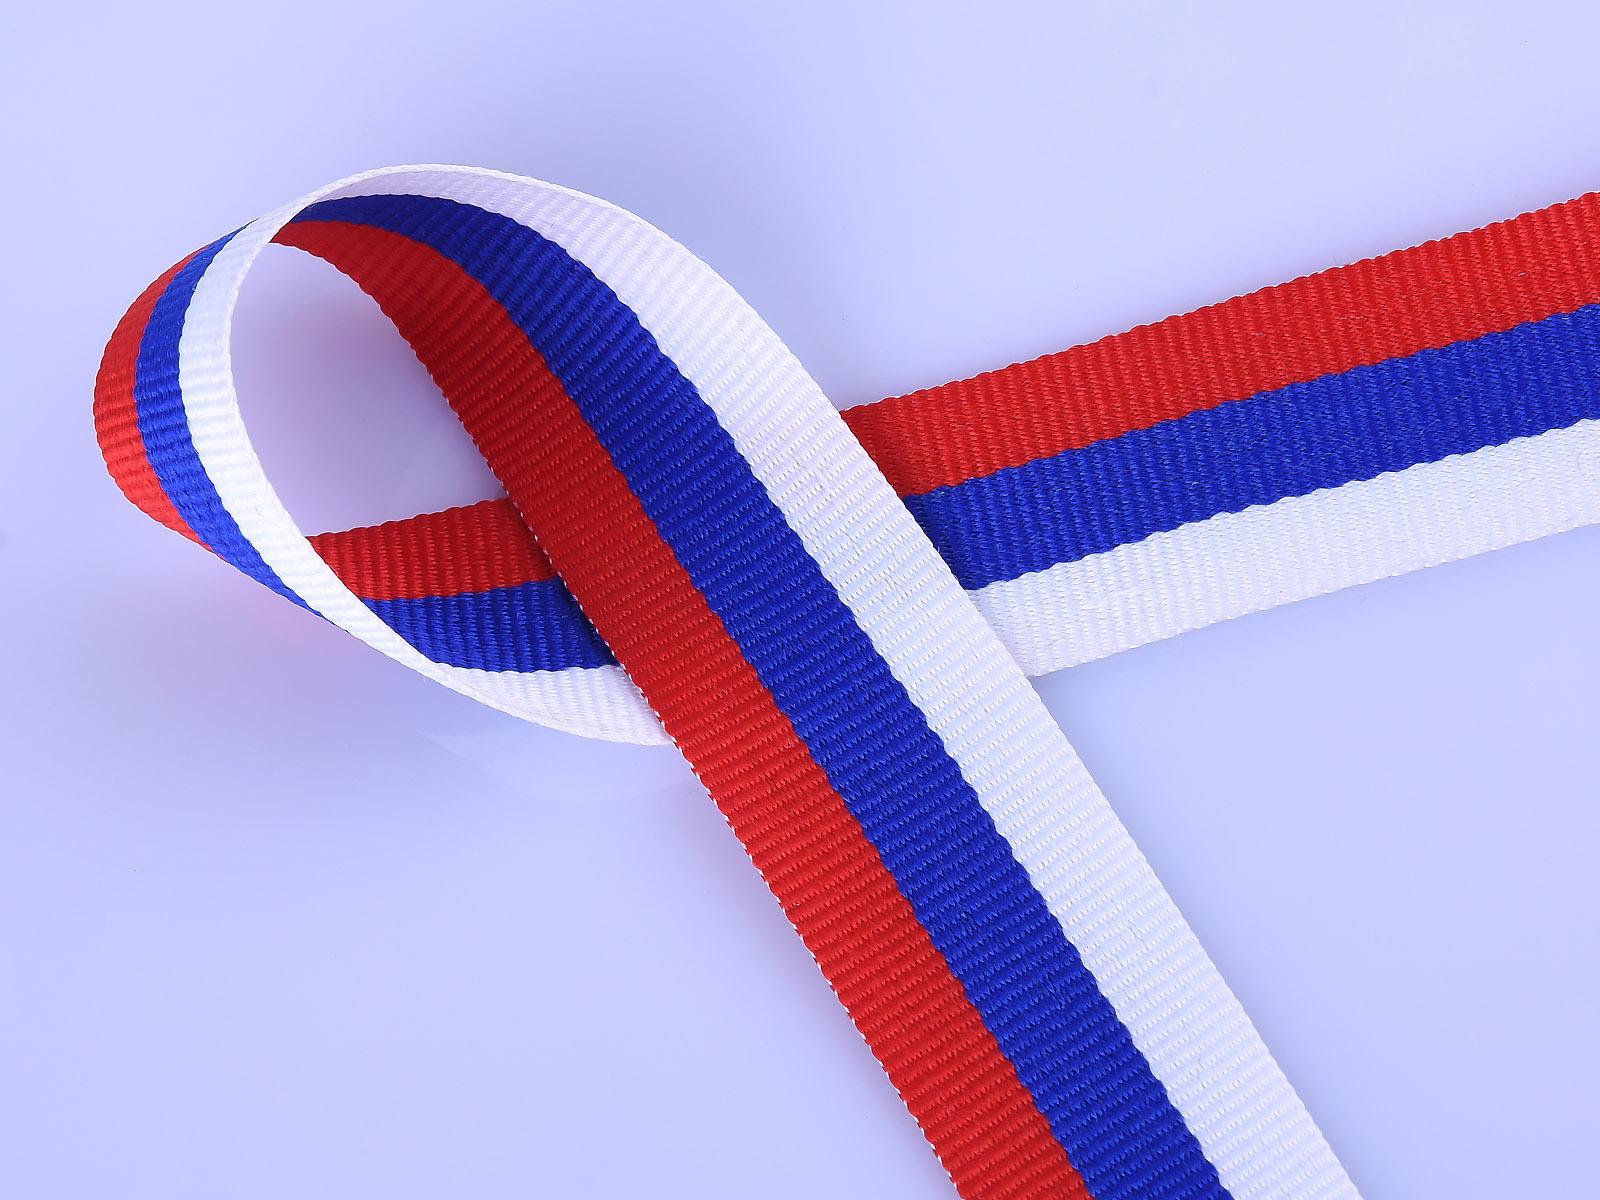 Лента российский триколор заказать онлайн